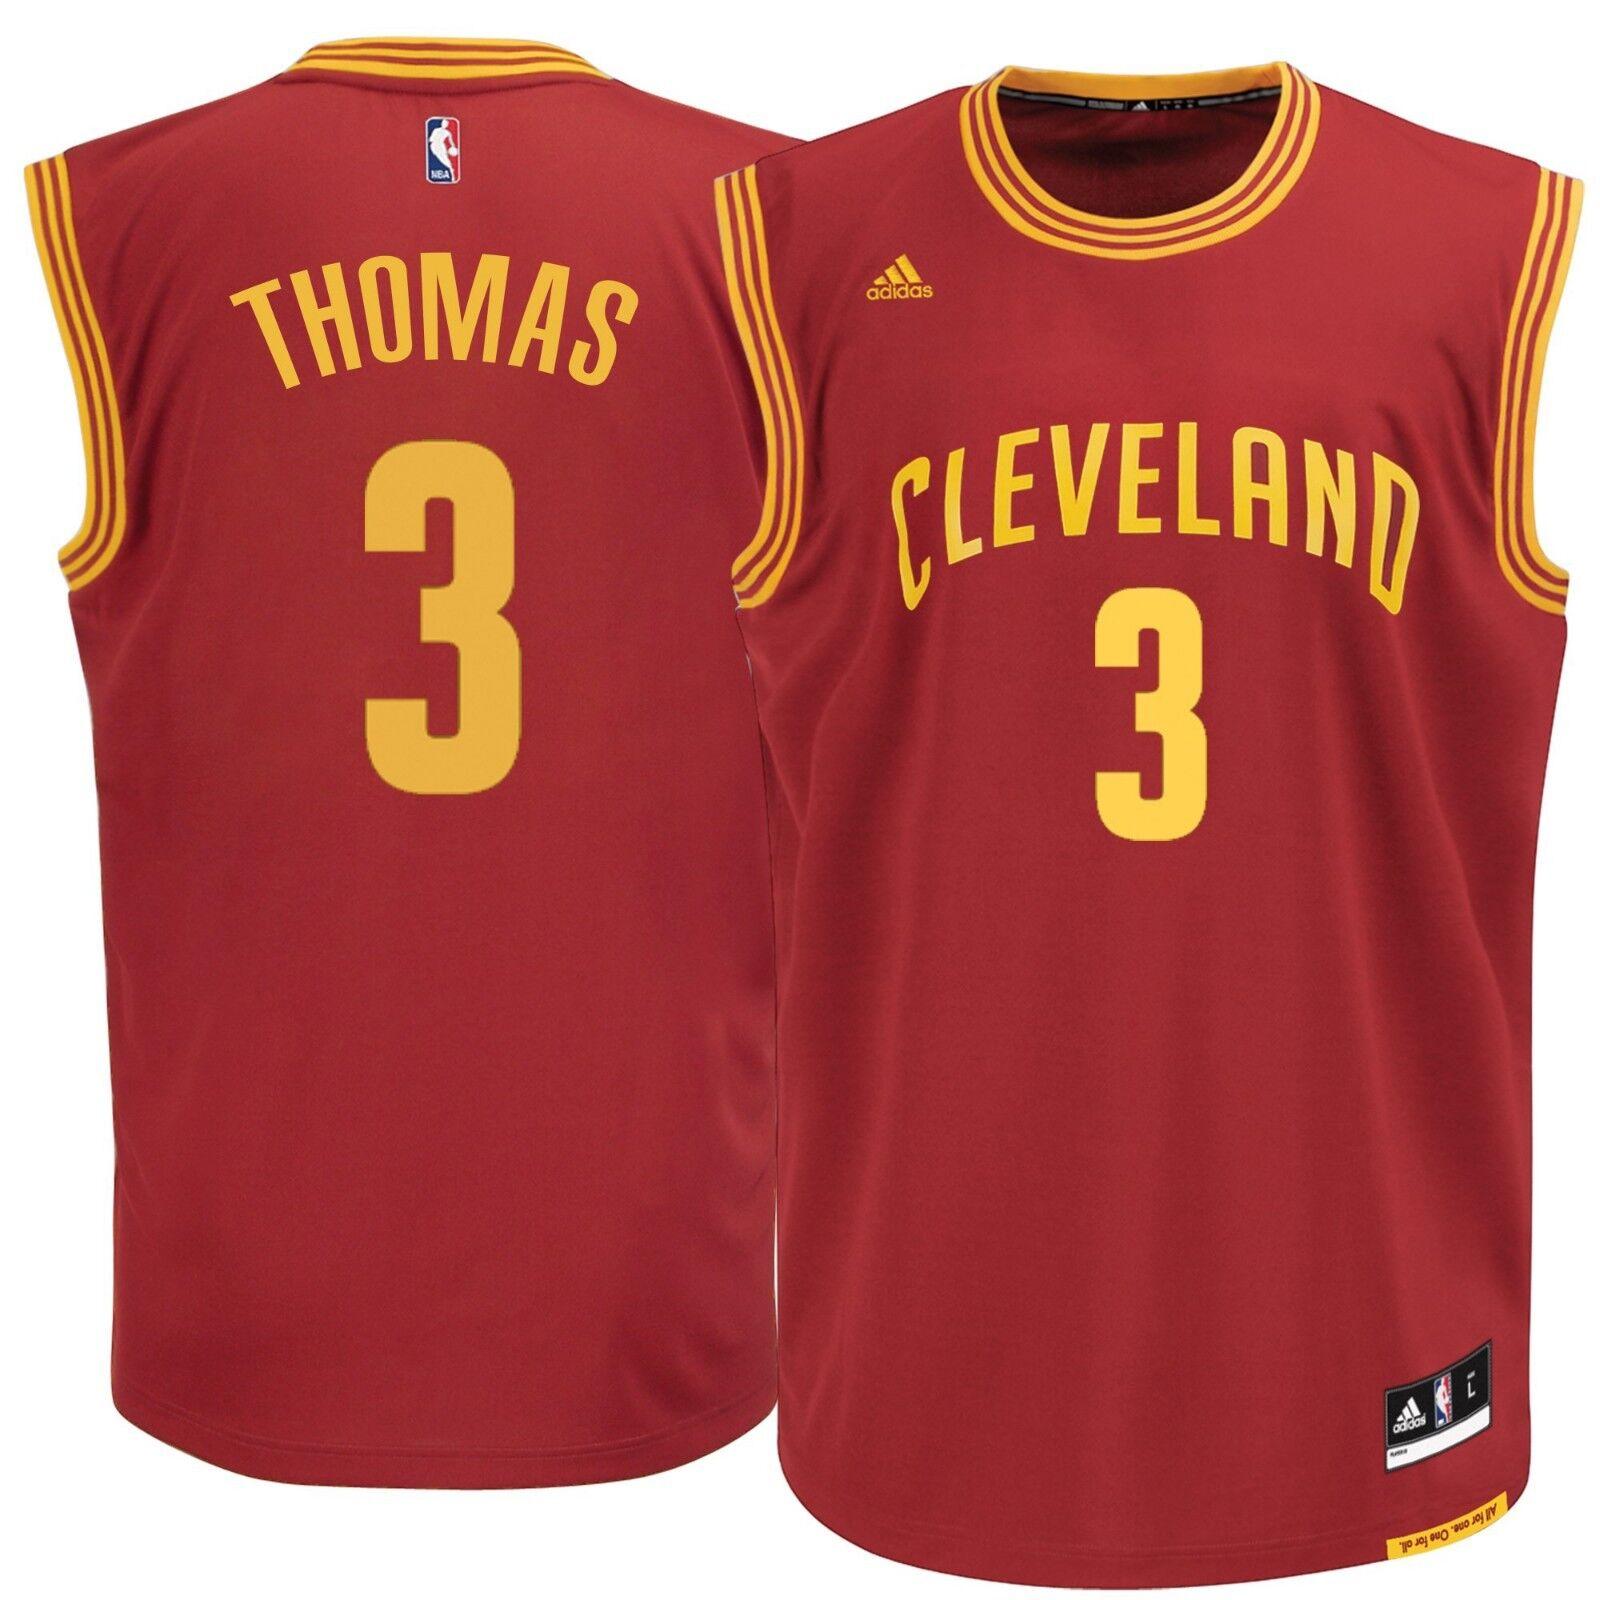 % Genuine Isaiah Thomas Cleveland Cavaliers adidas  Replica Jersey L- Burgundy